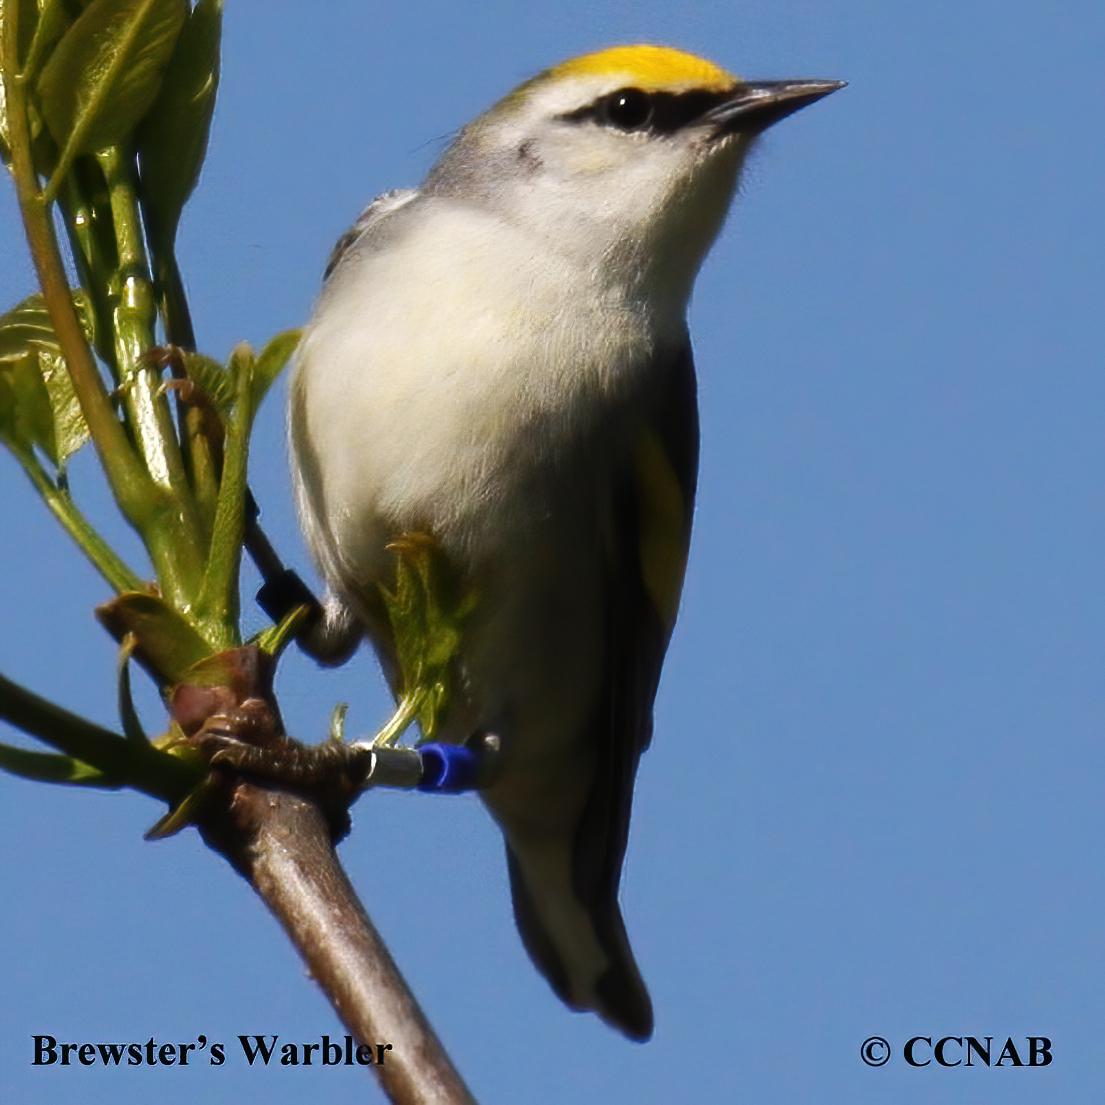 Brewster's Warbler